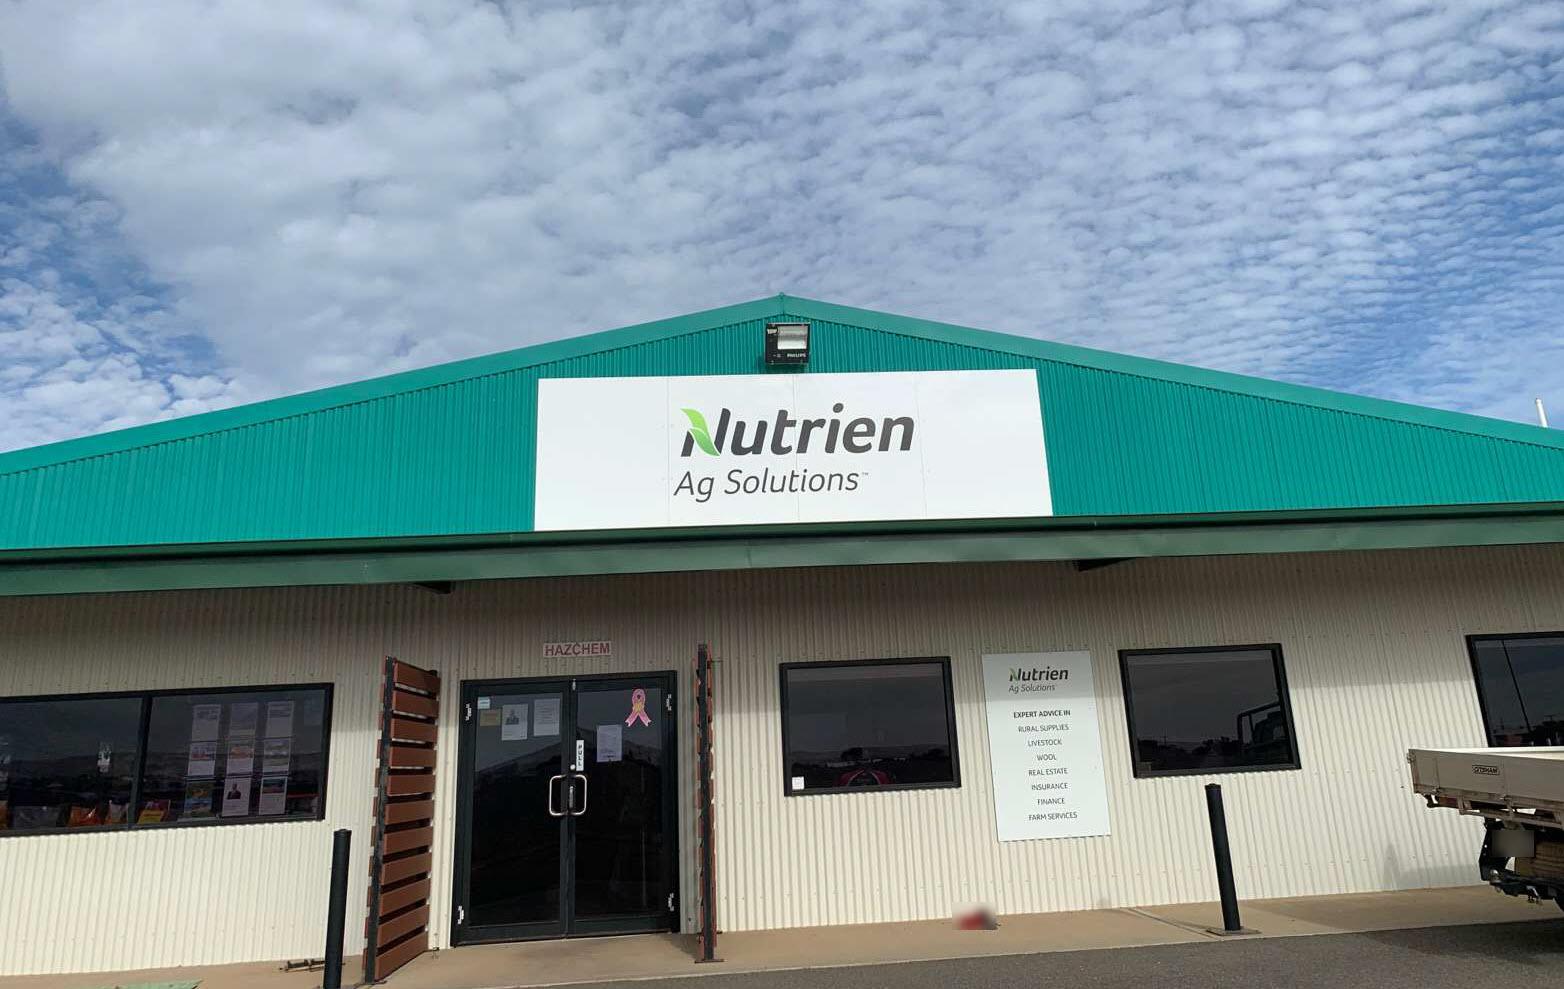 Nutrien Ag Solutions - Tumby Bay, SA 5605 - (08) 8688 2624 | ShowMeLocal.com